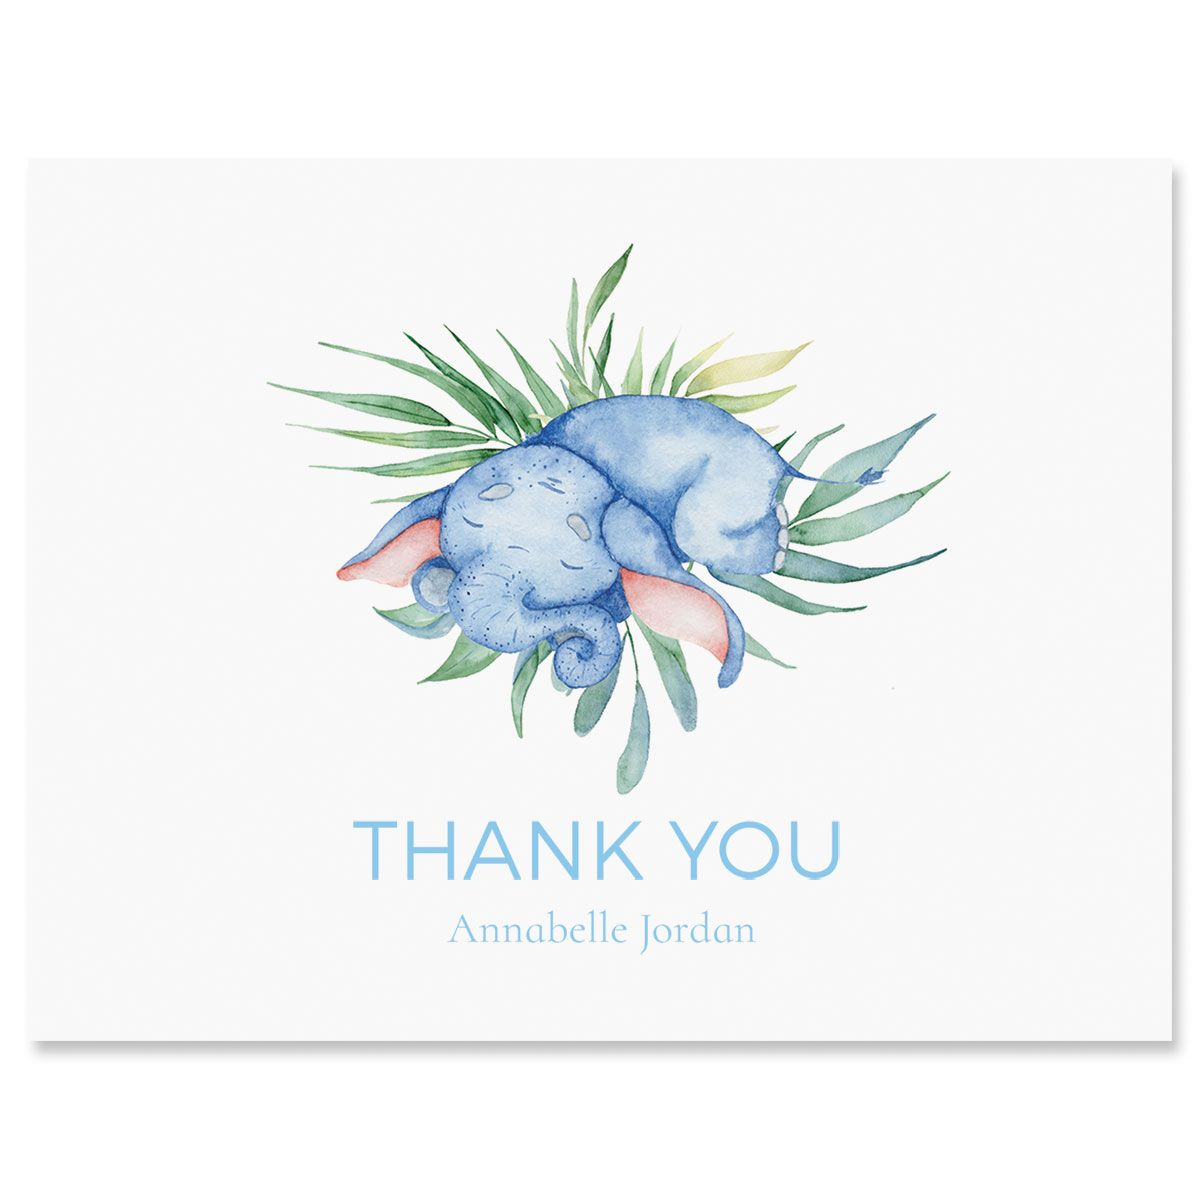 Sleeping Elephant Personalized Thank You Cards